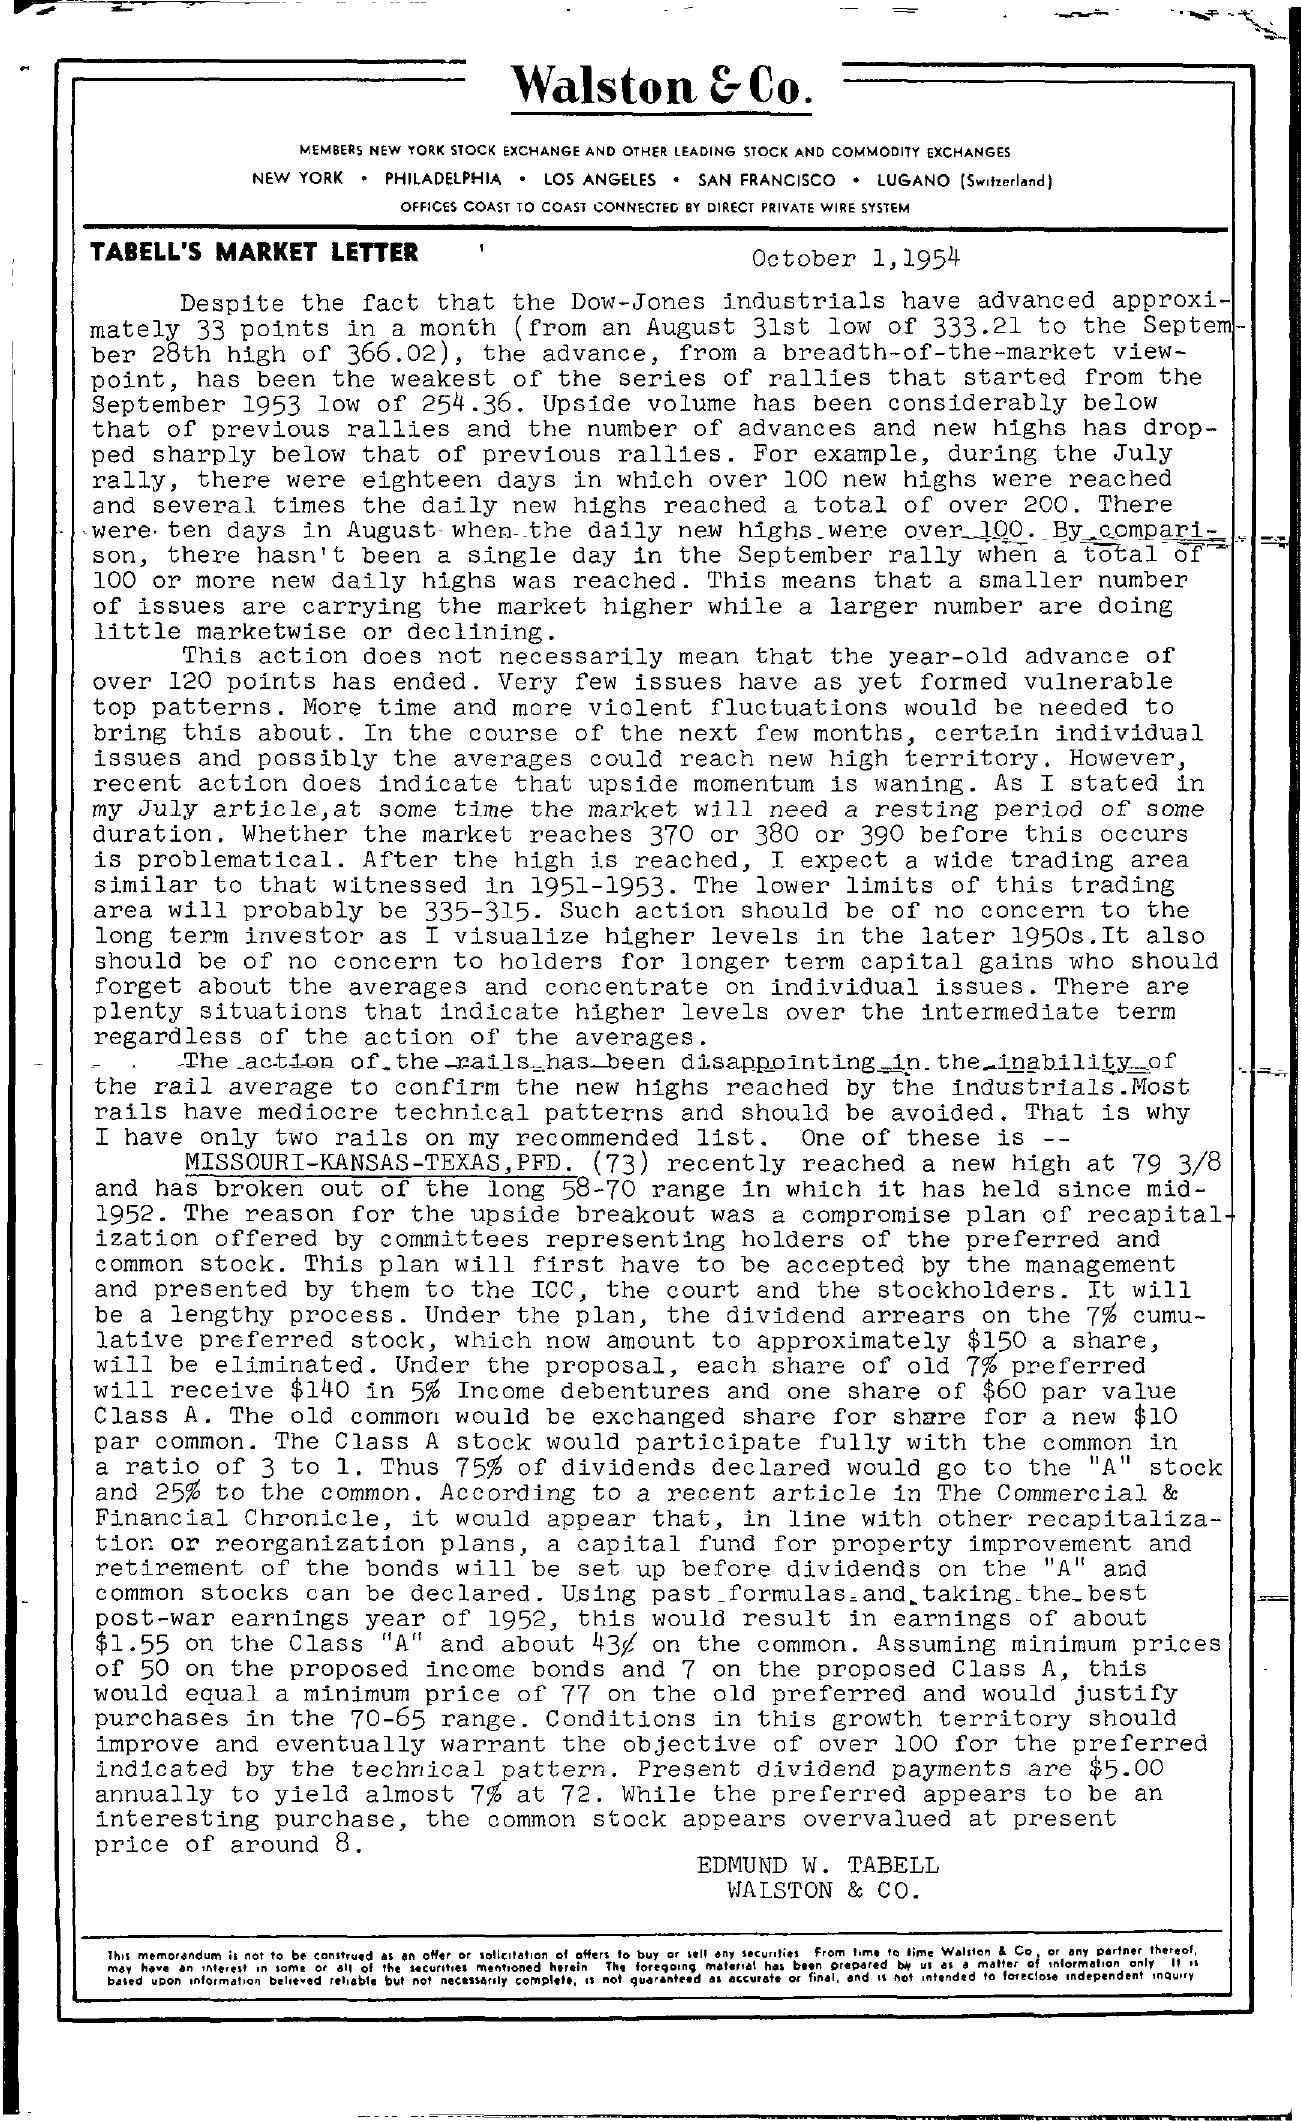 Tabell's Market Letter - October 01, 1954